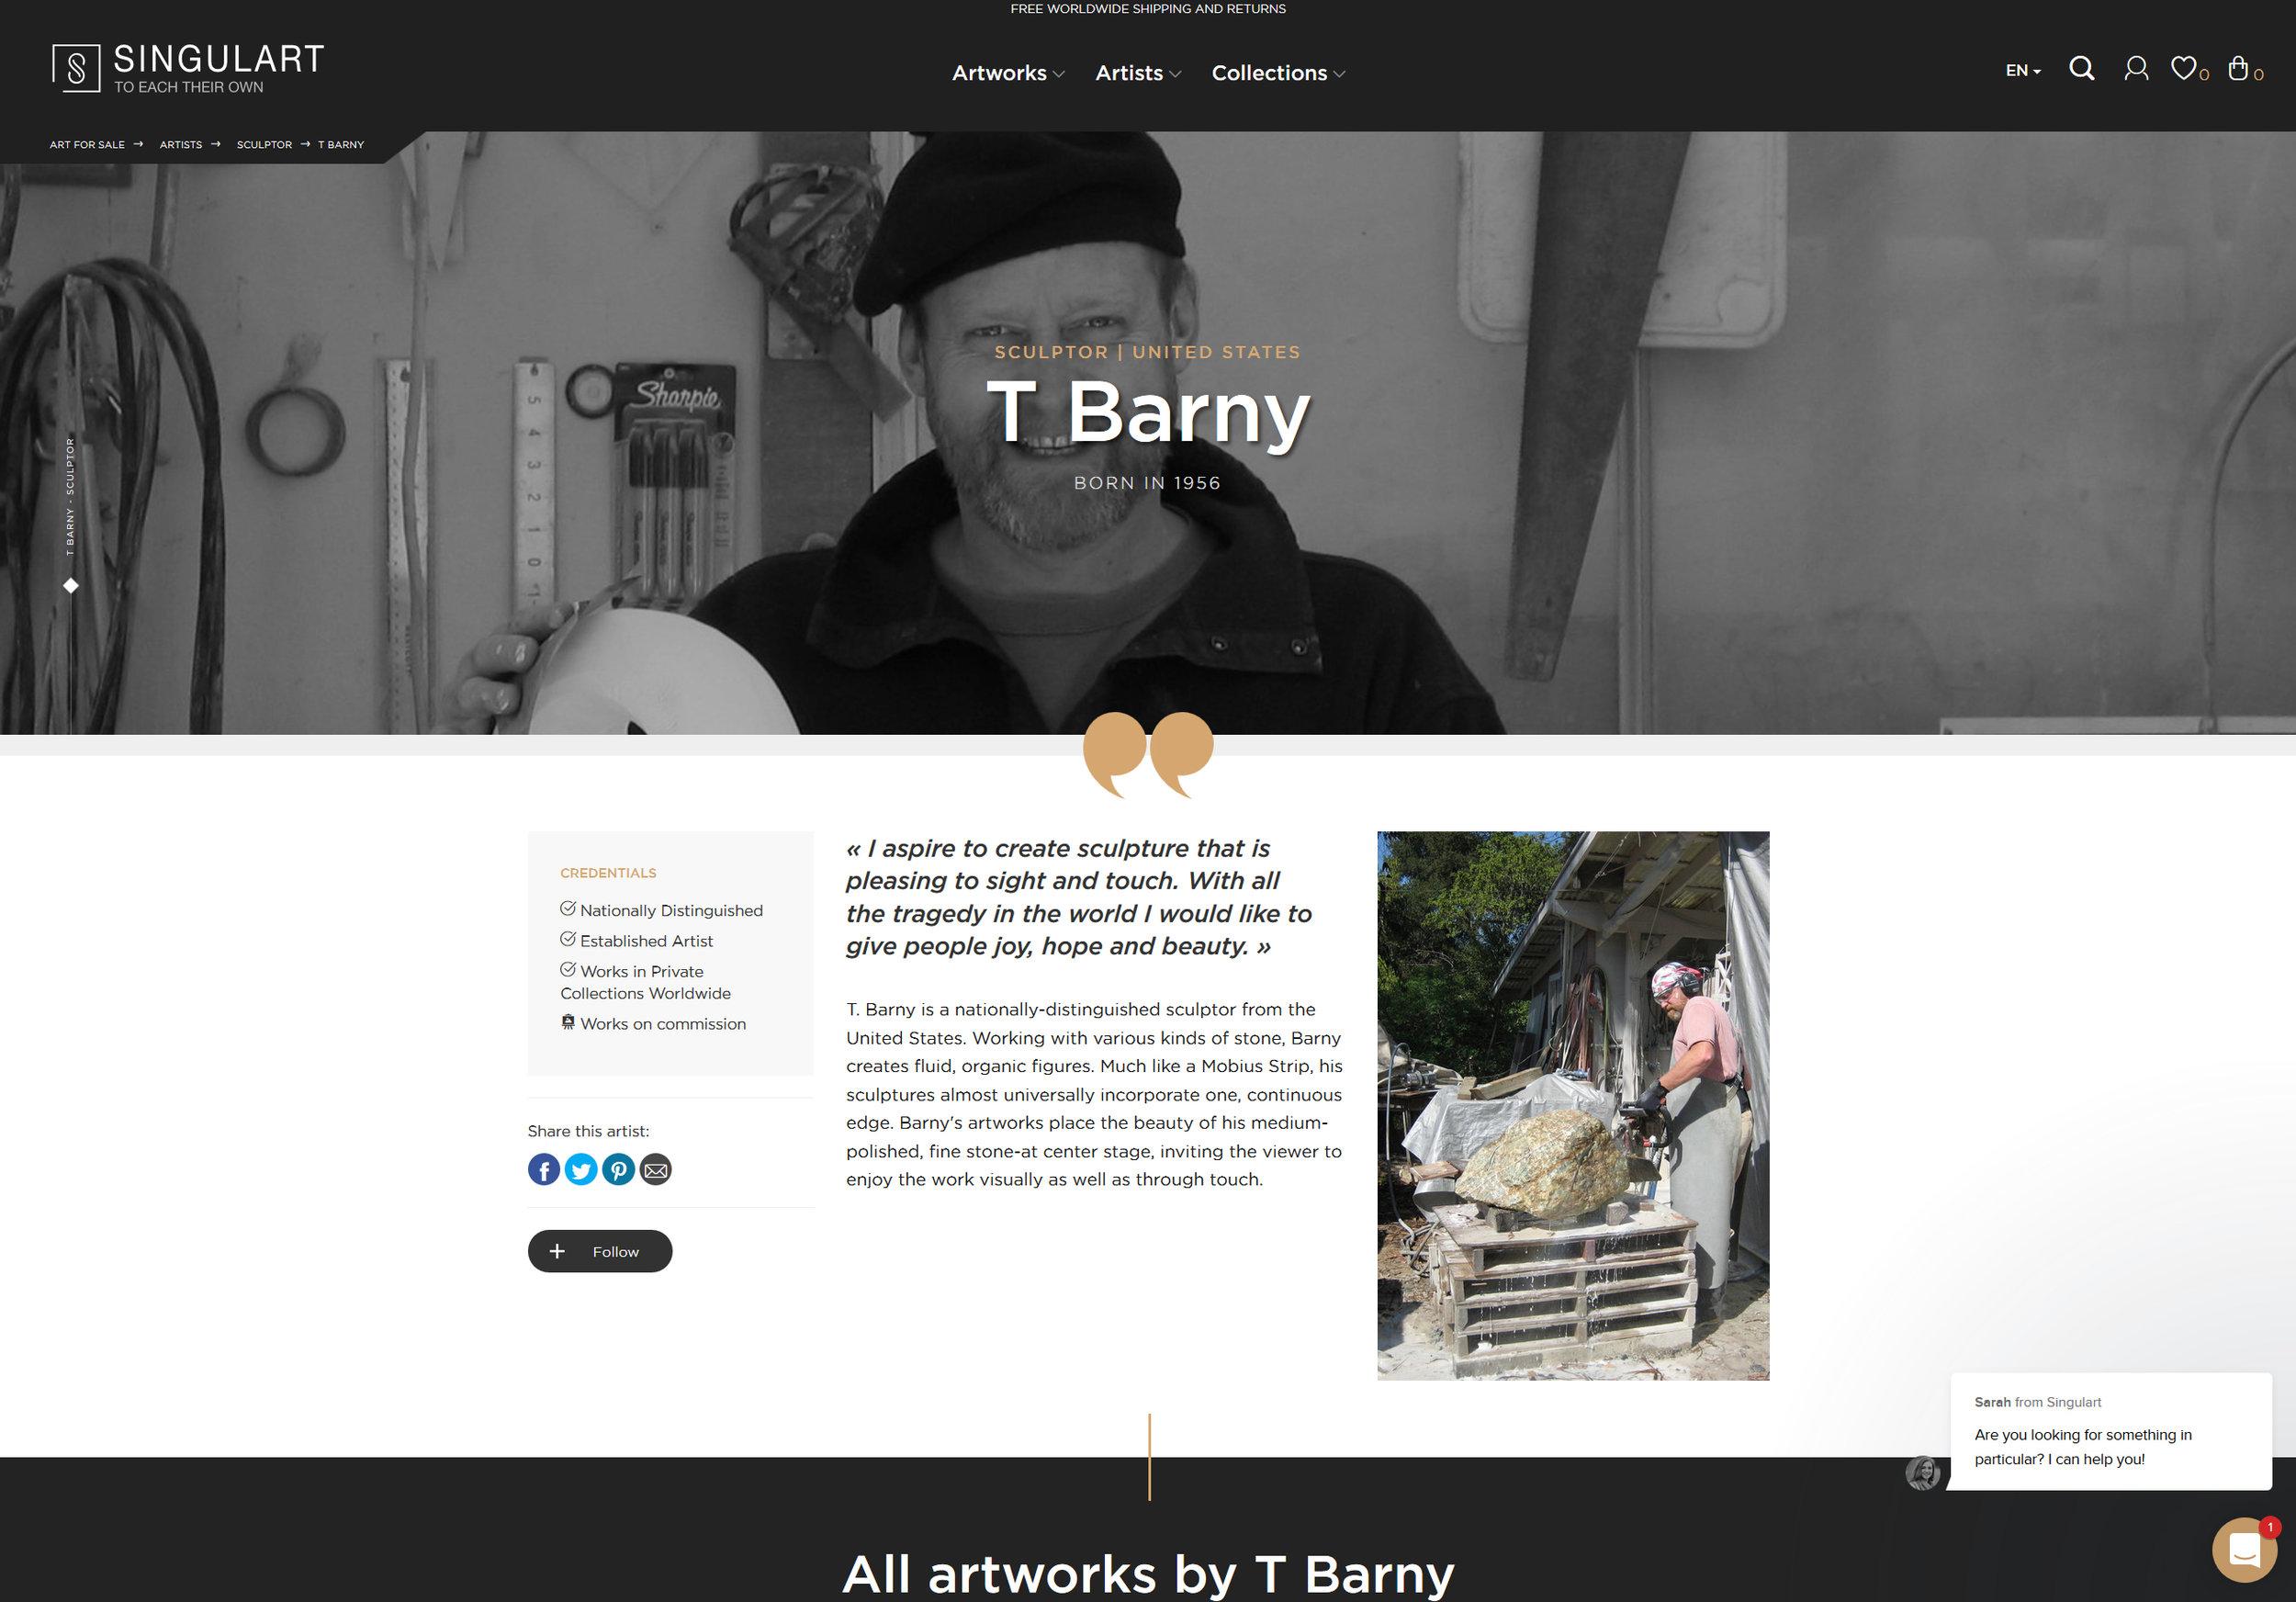 singulart t barny profile.jpg